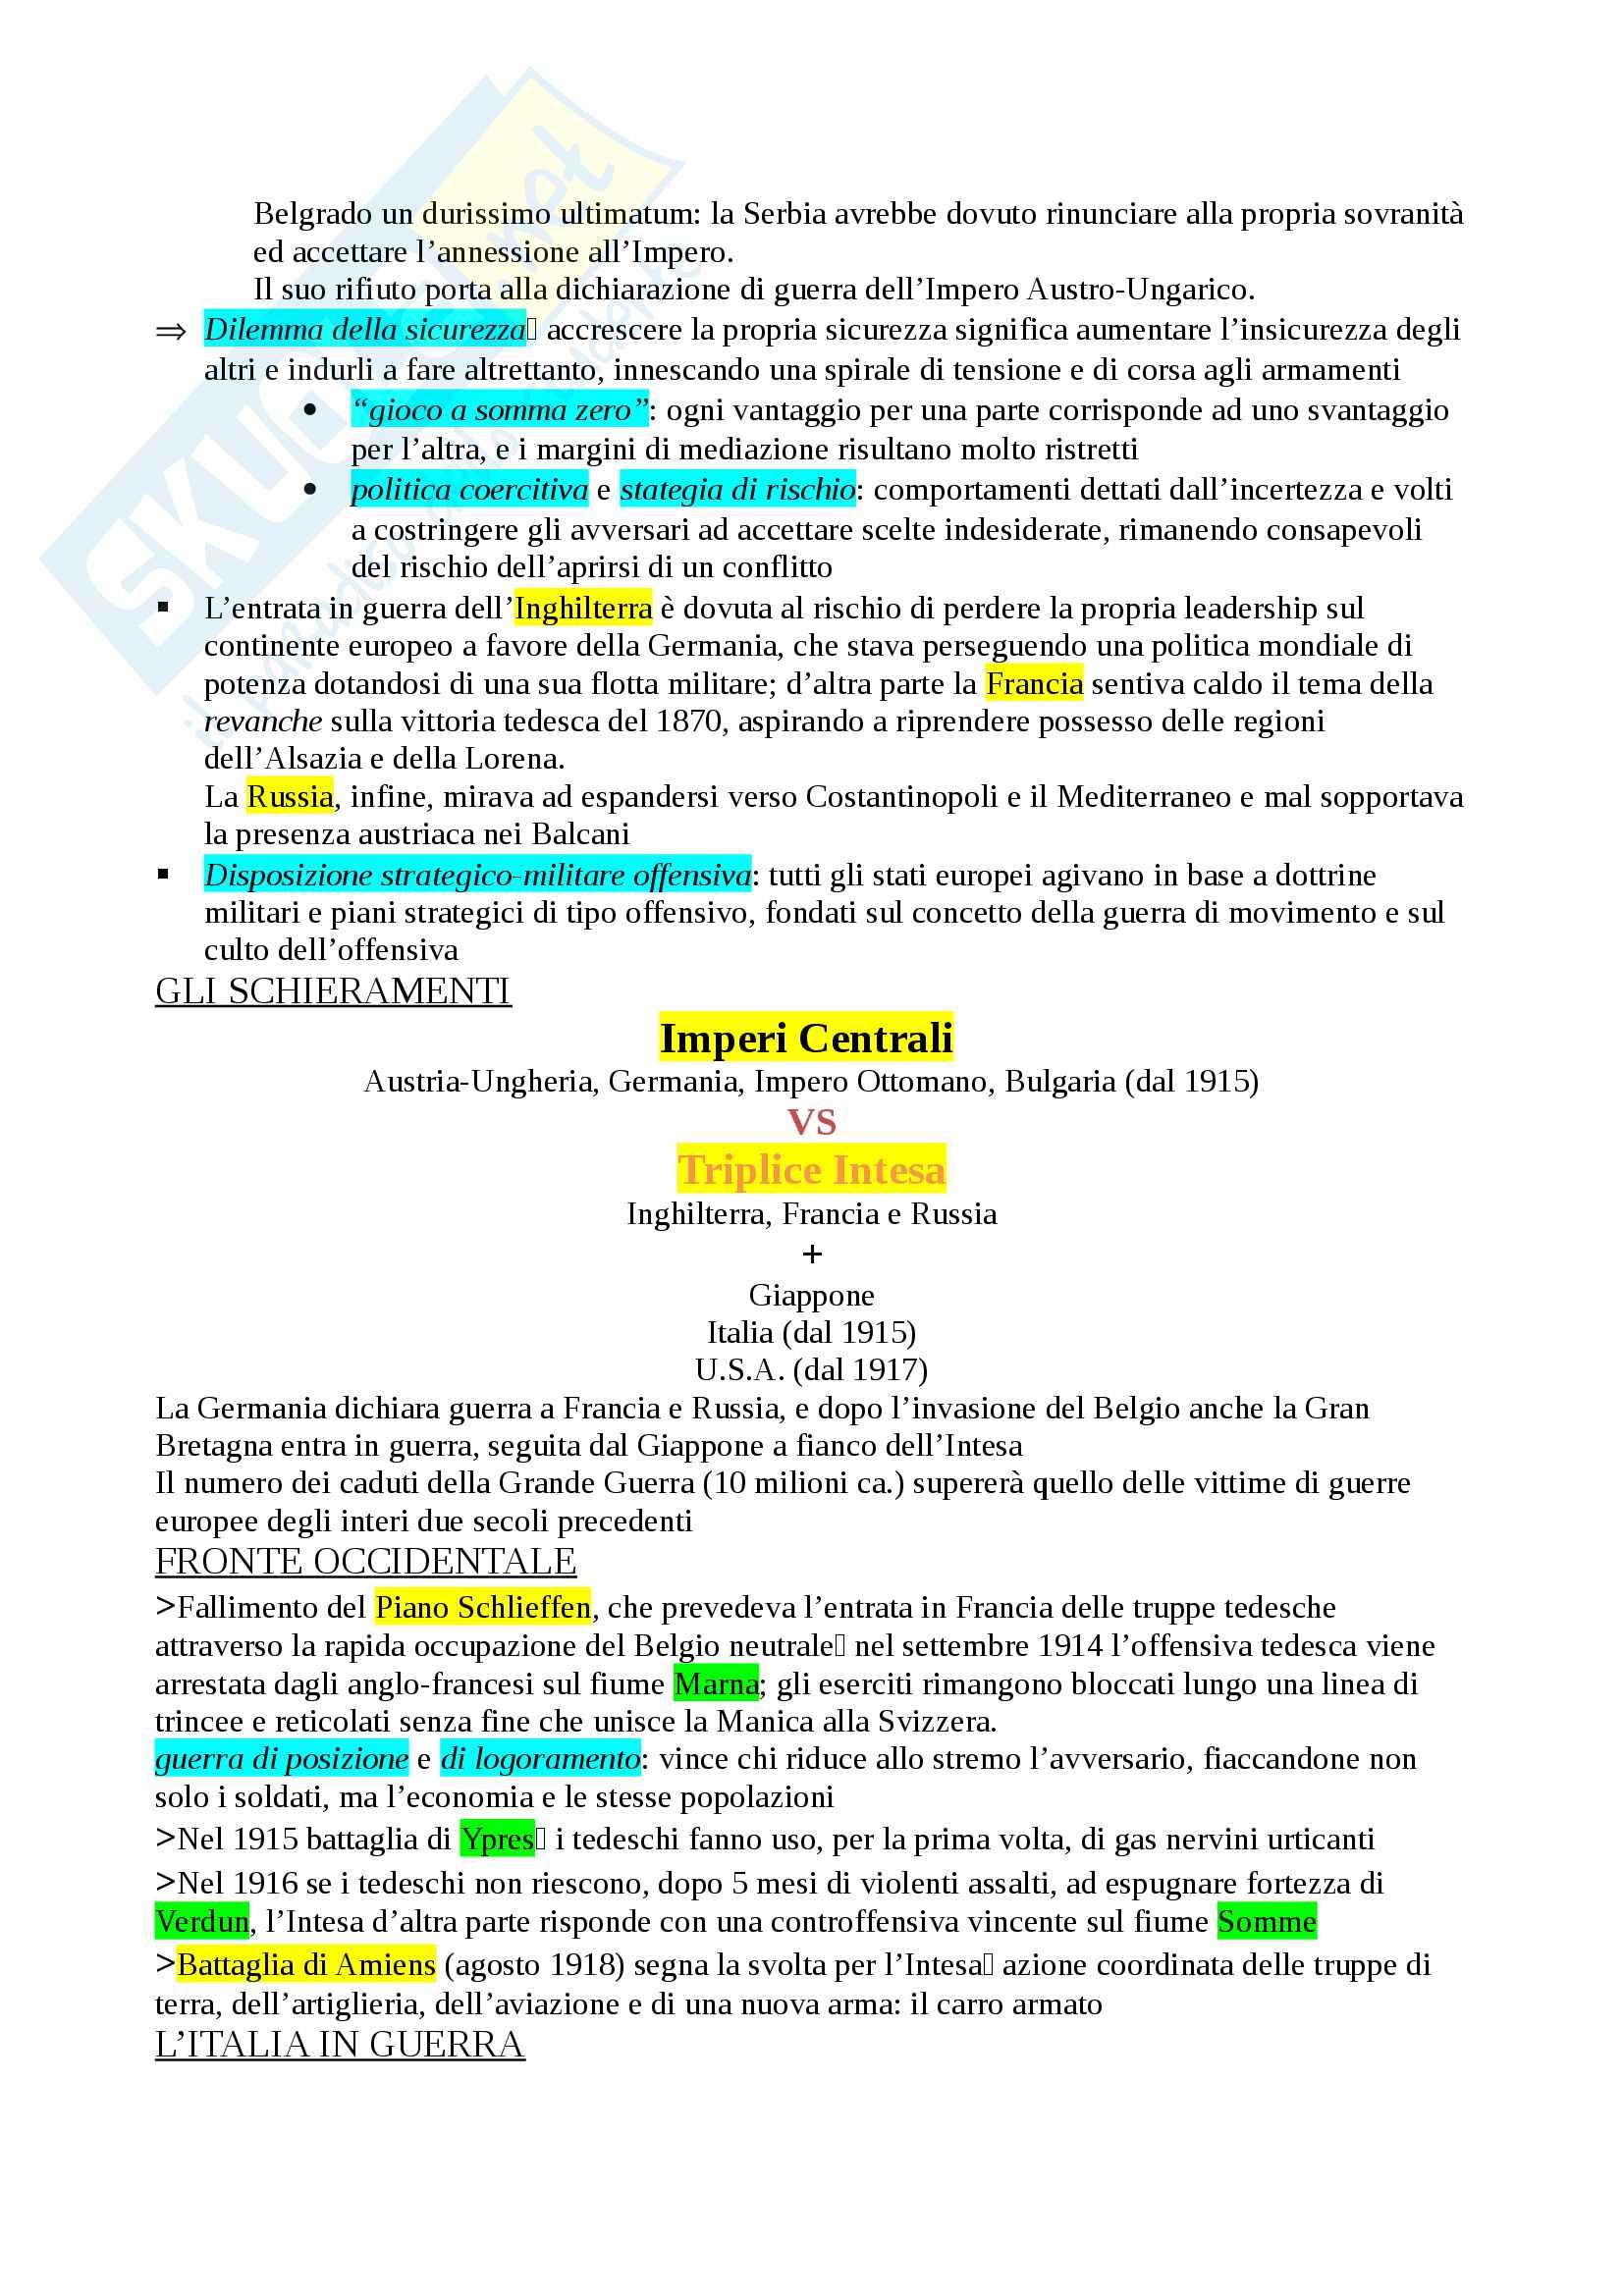 Cuzzi Storia contemporanea Pag. 2